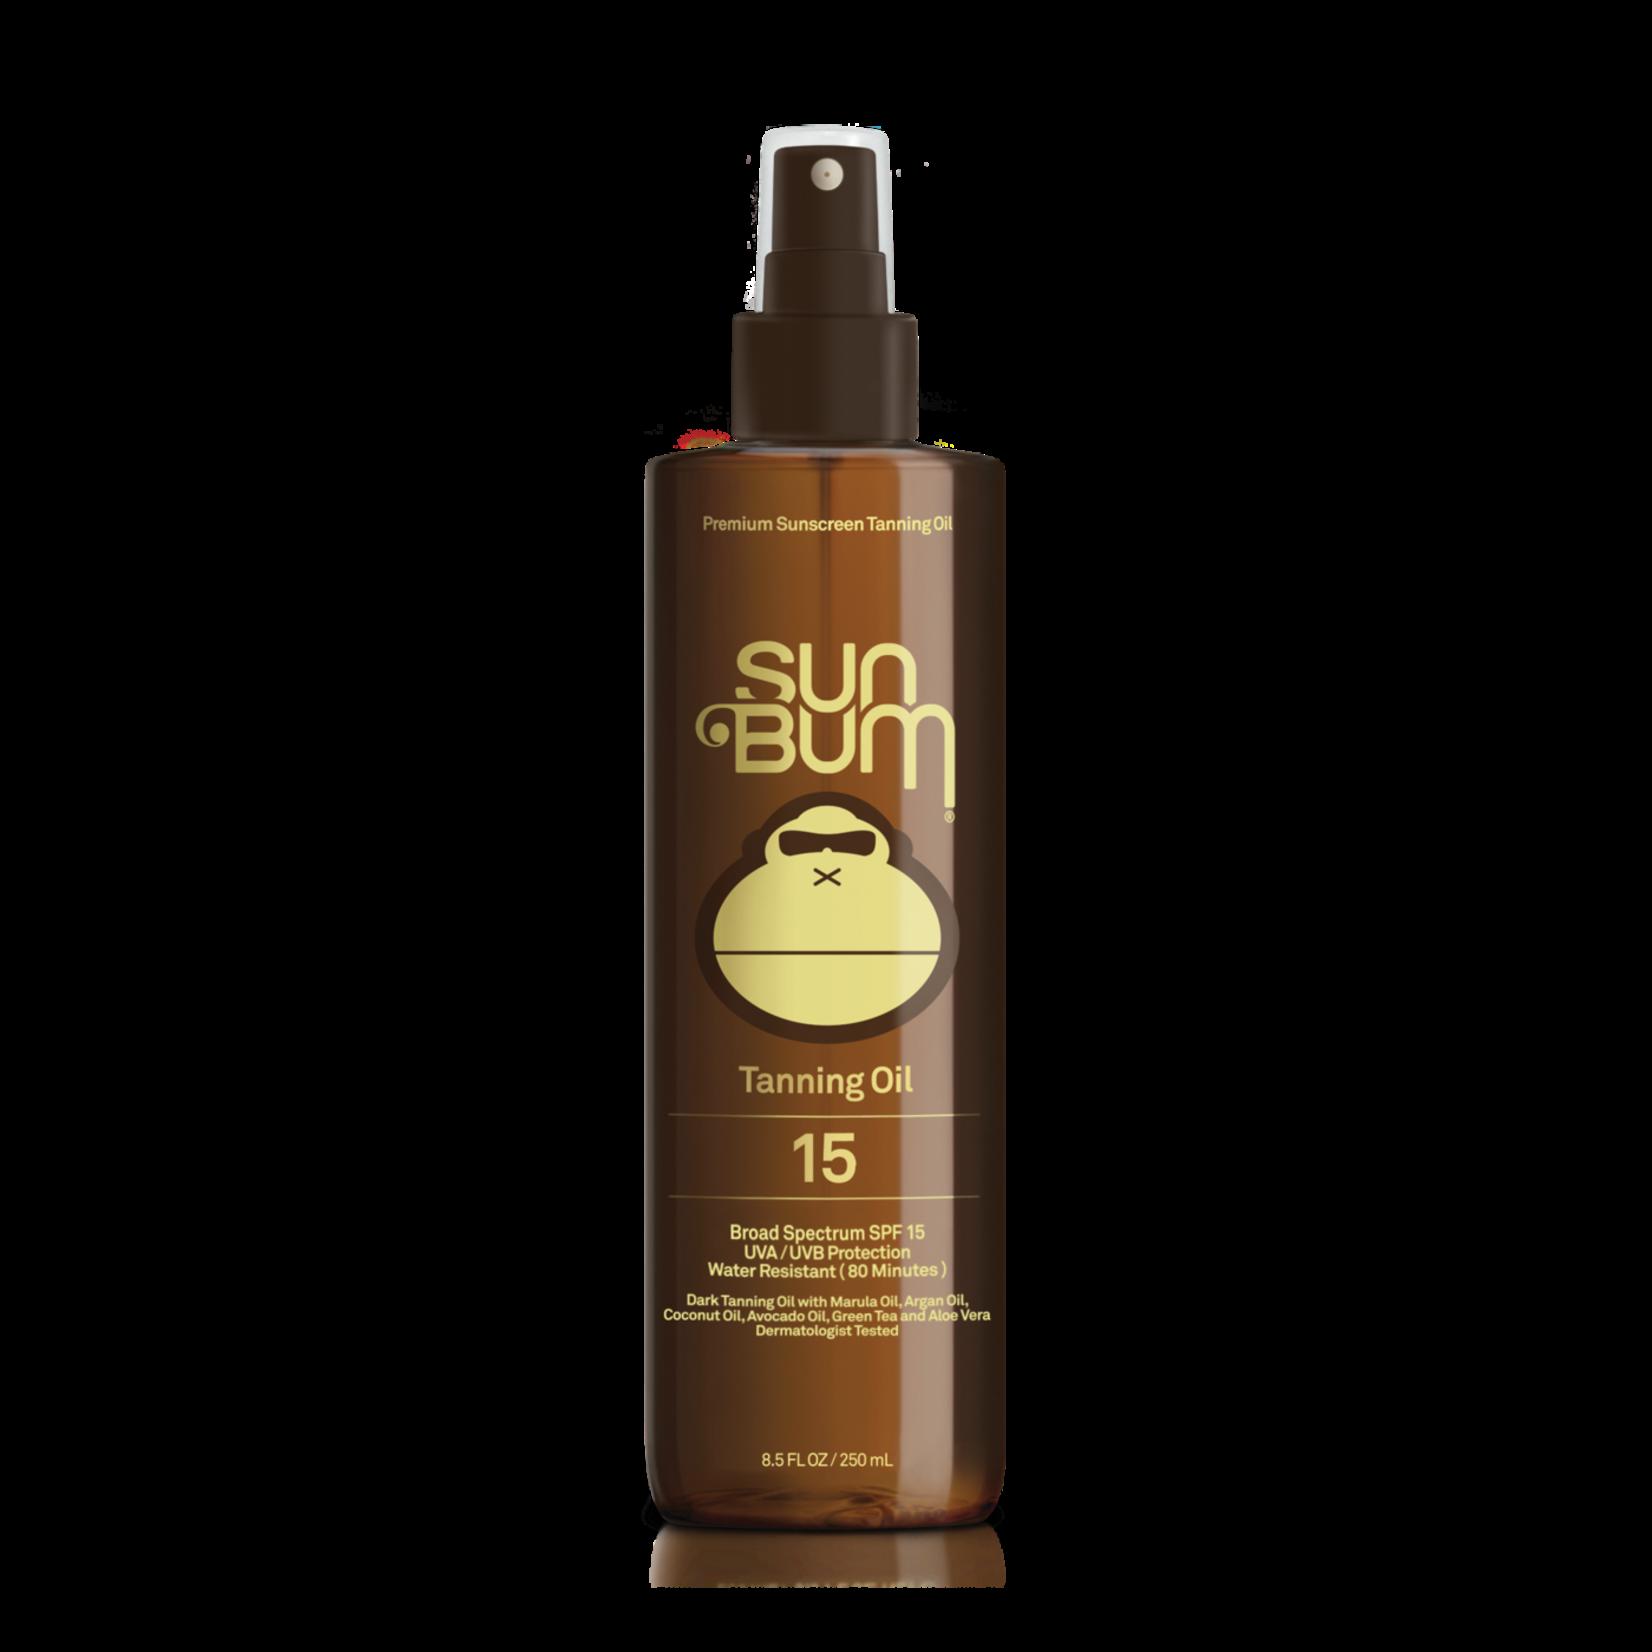 Sun Bum Sun Bum Spf 15 Tanning Oil 8.5 Oz